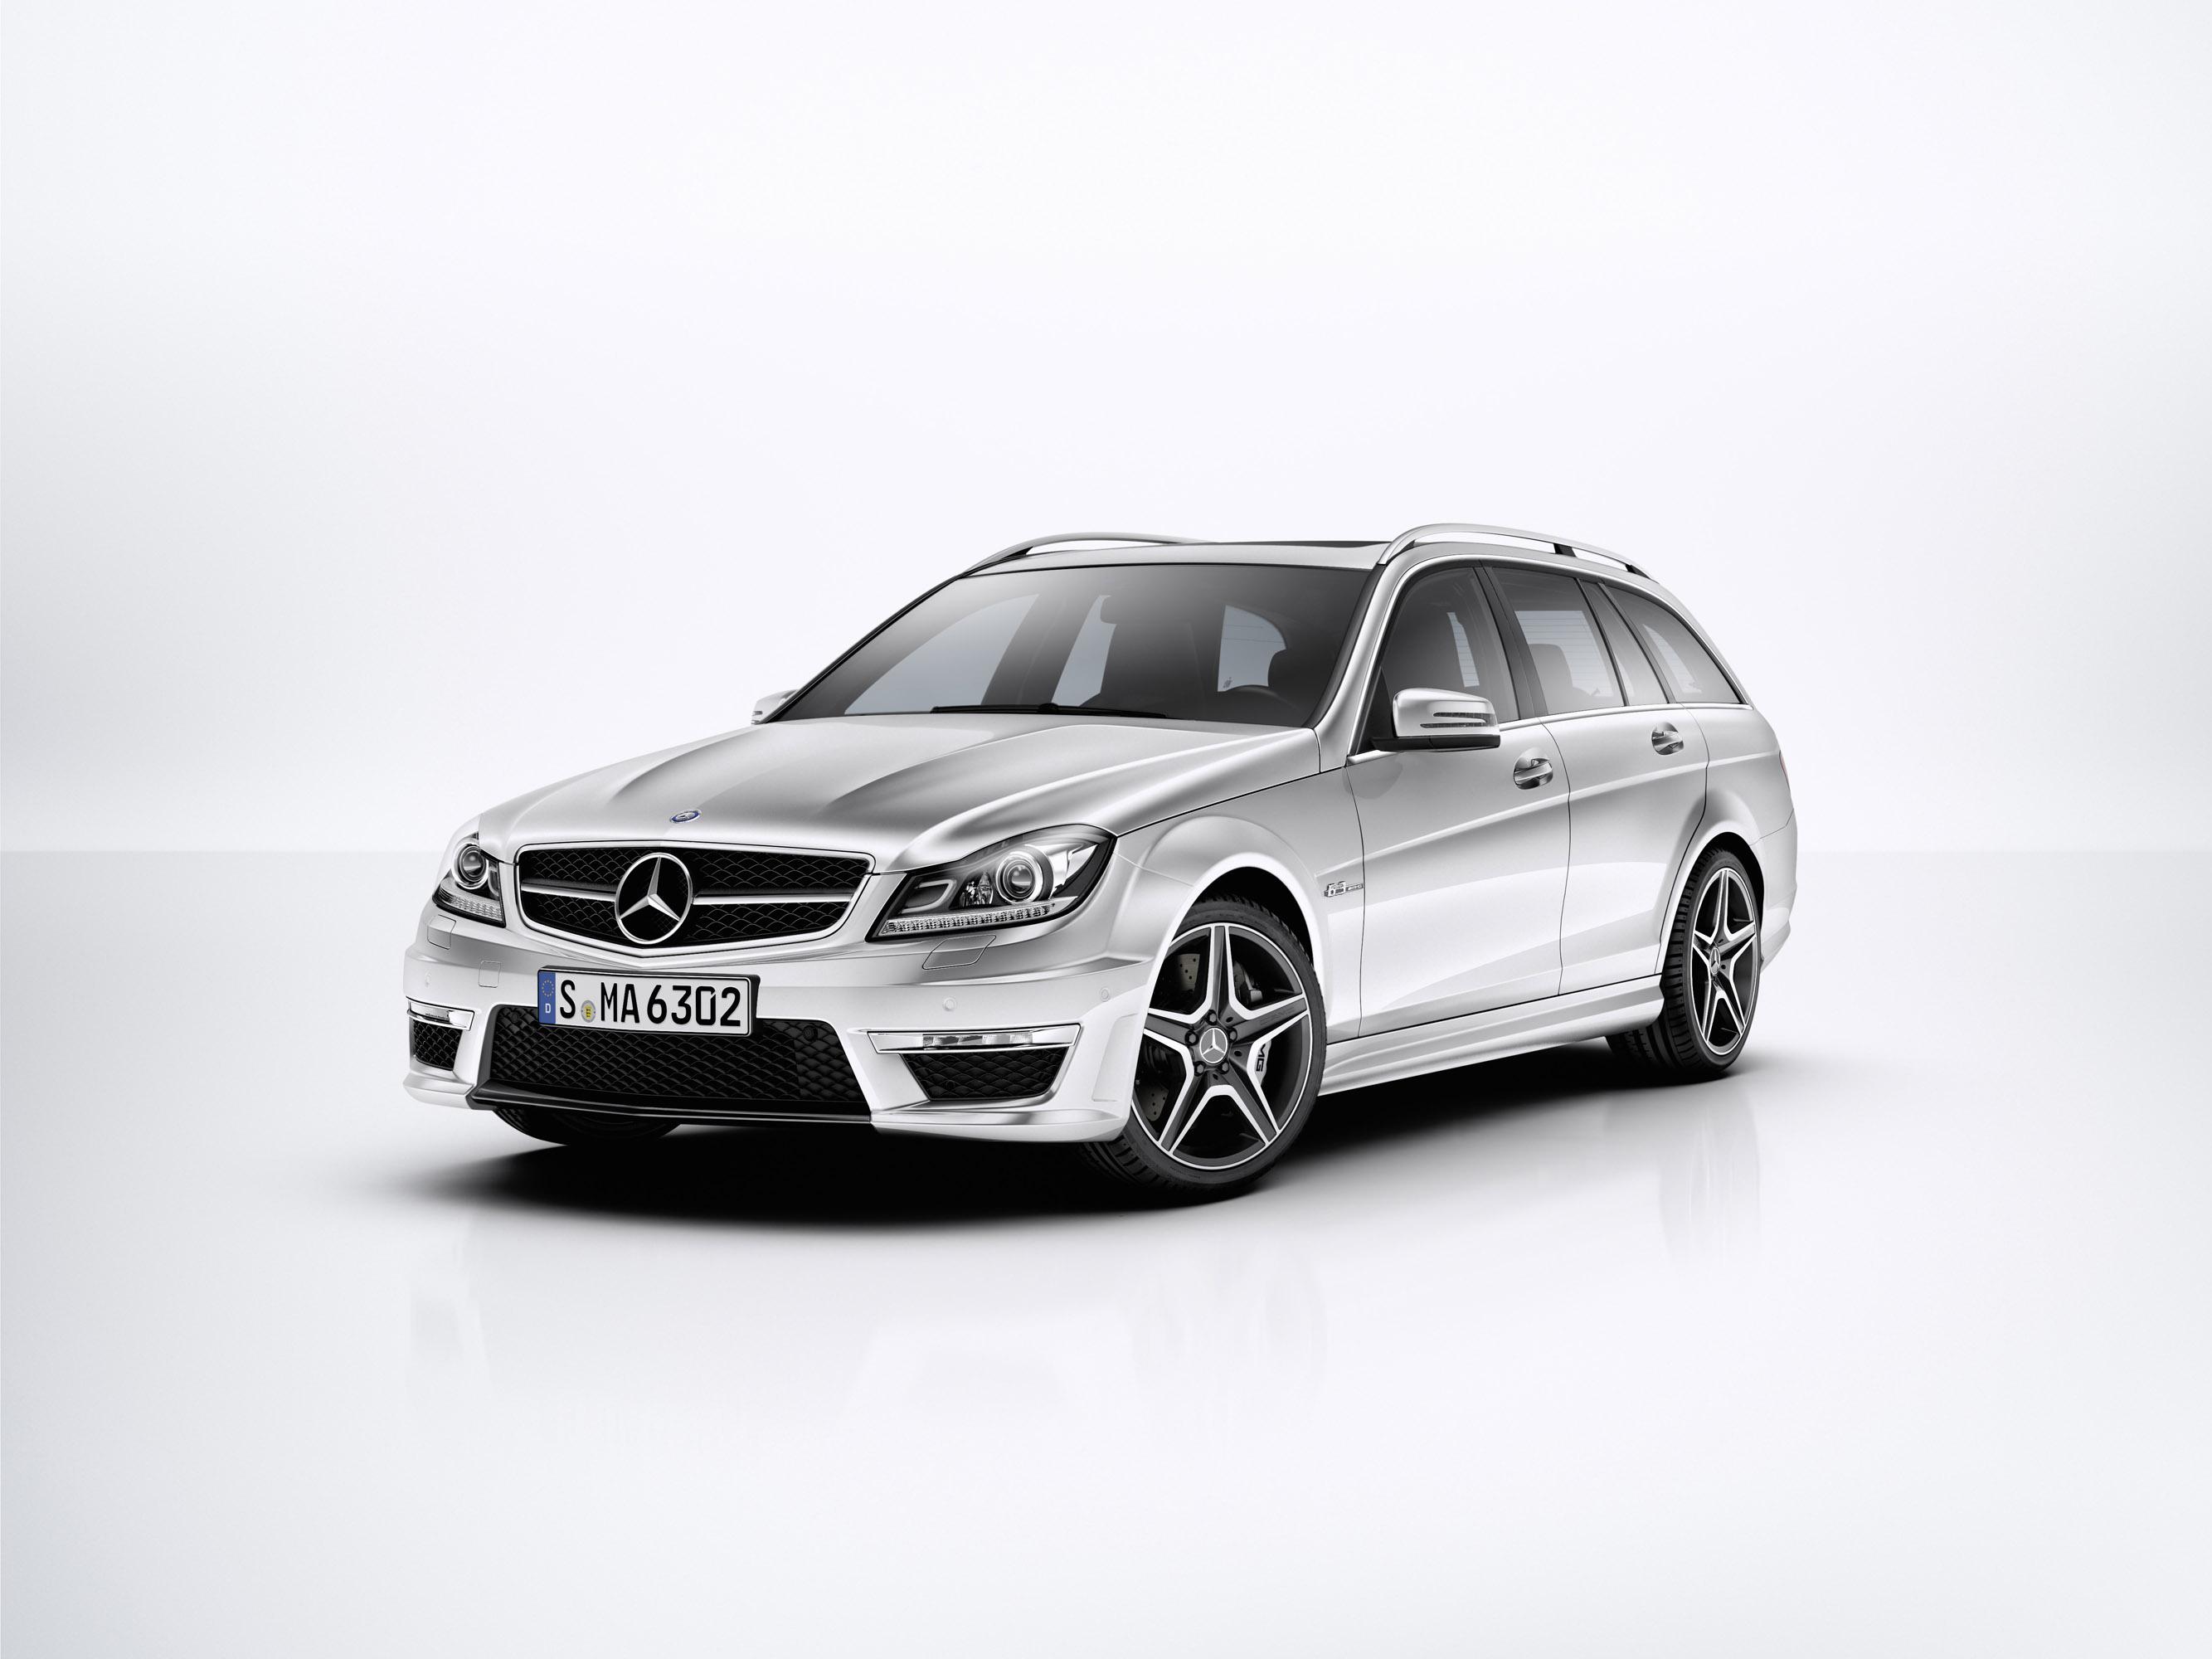 Mercedes-Benz C63 AMG Estate photo #1